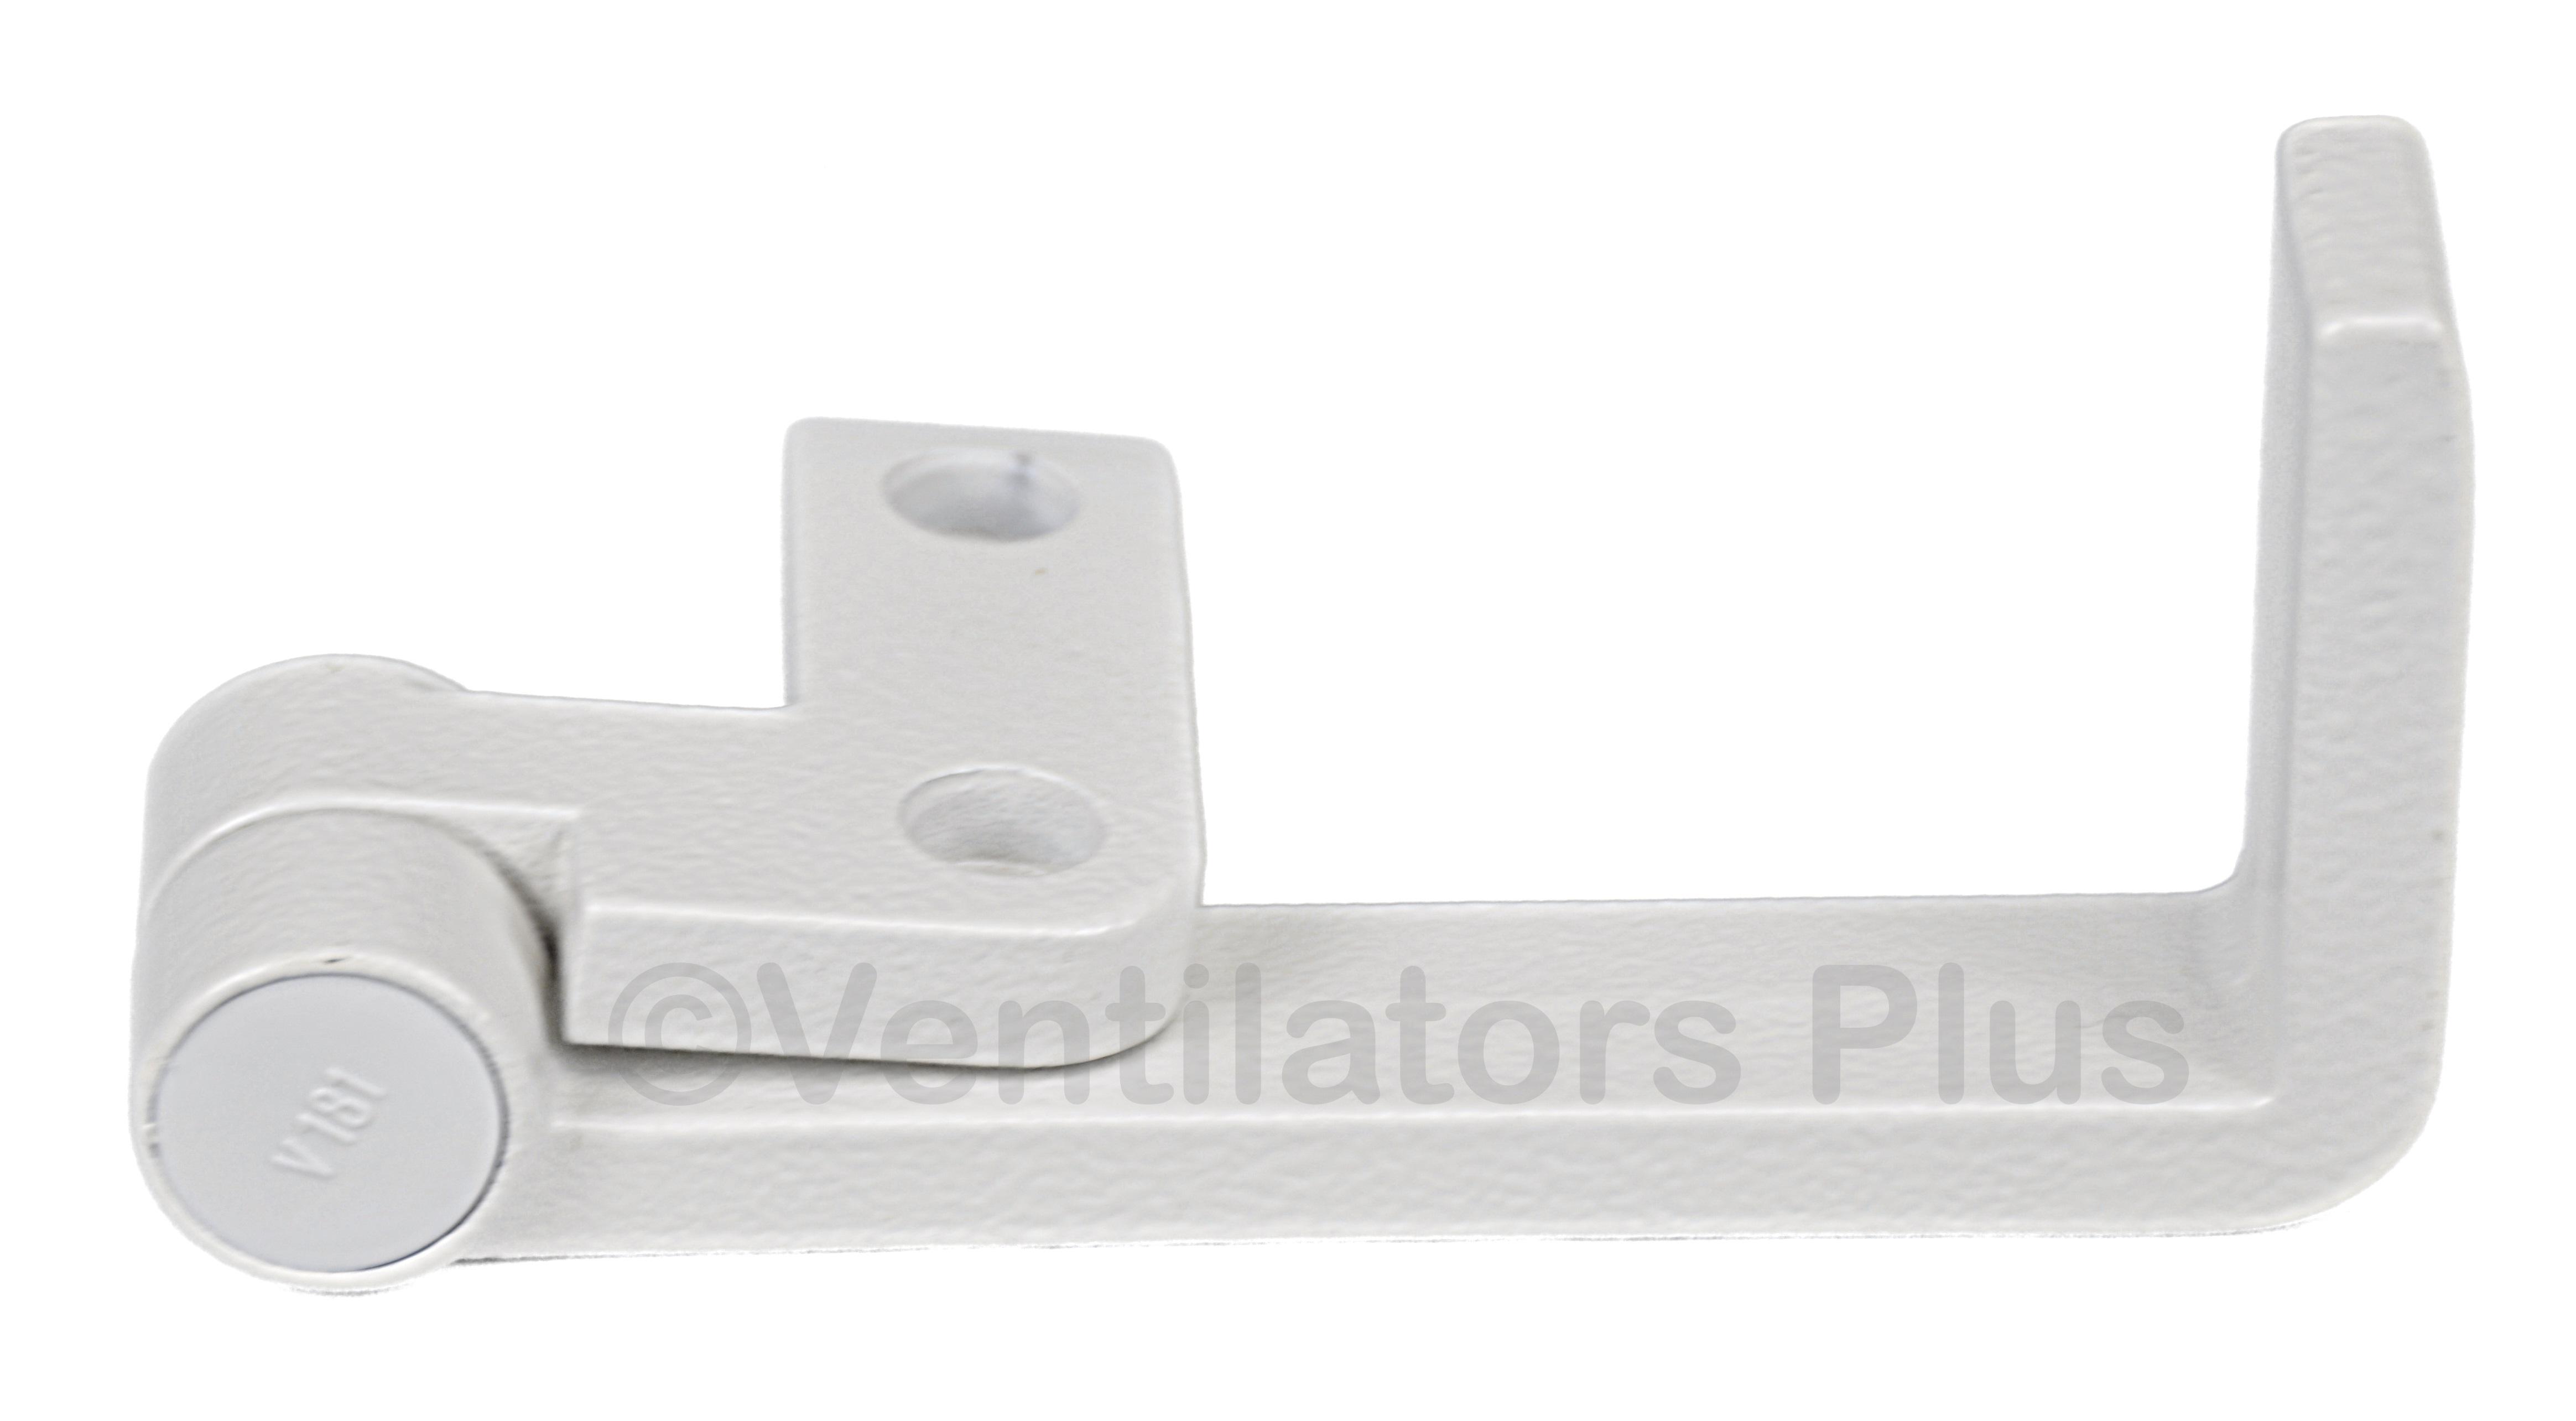 > 8411956 Humidifier Bracket Kit Drager Medical Evita Ventilator #413E38